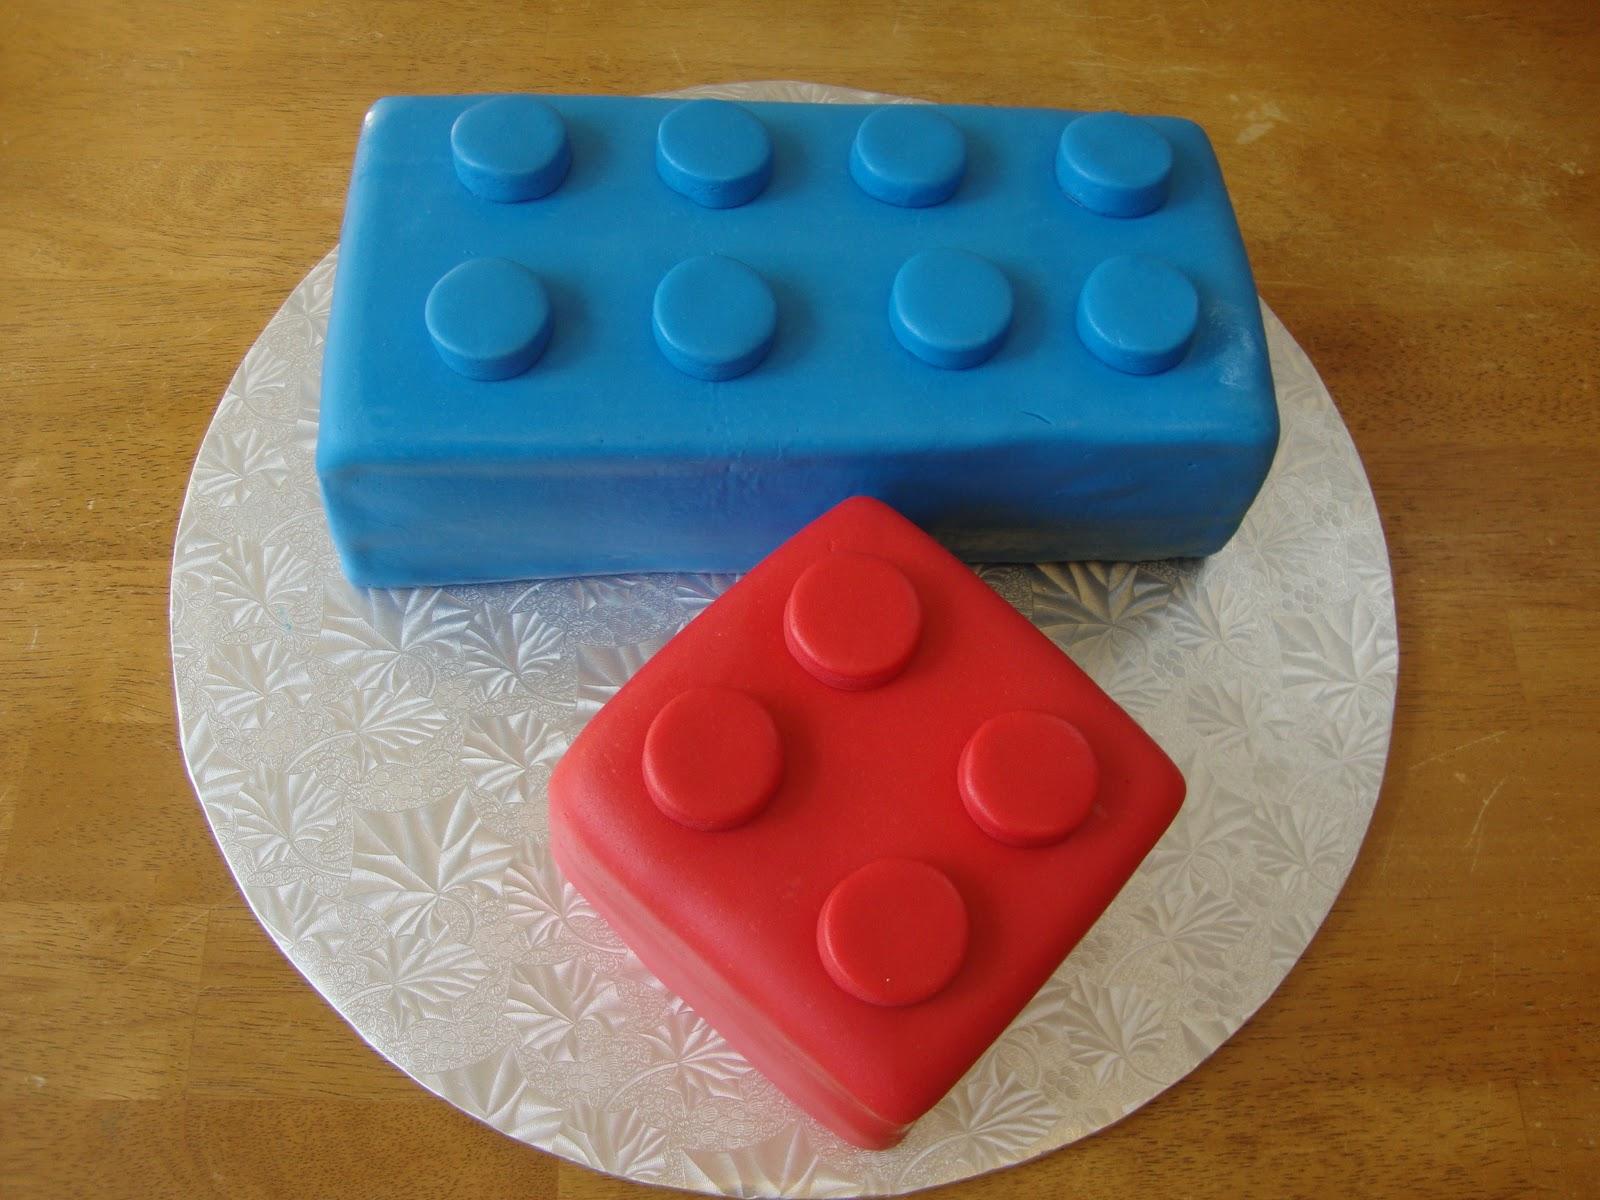 Whimsy Girls Cakes: Lego Cake & Cupcakes